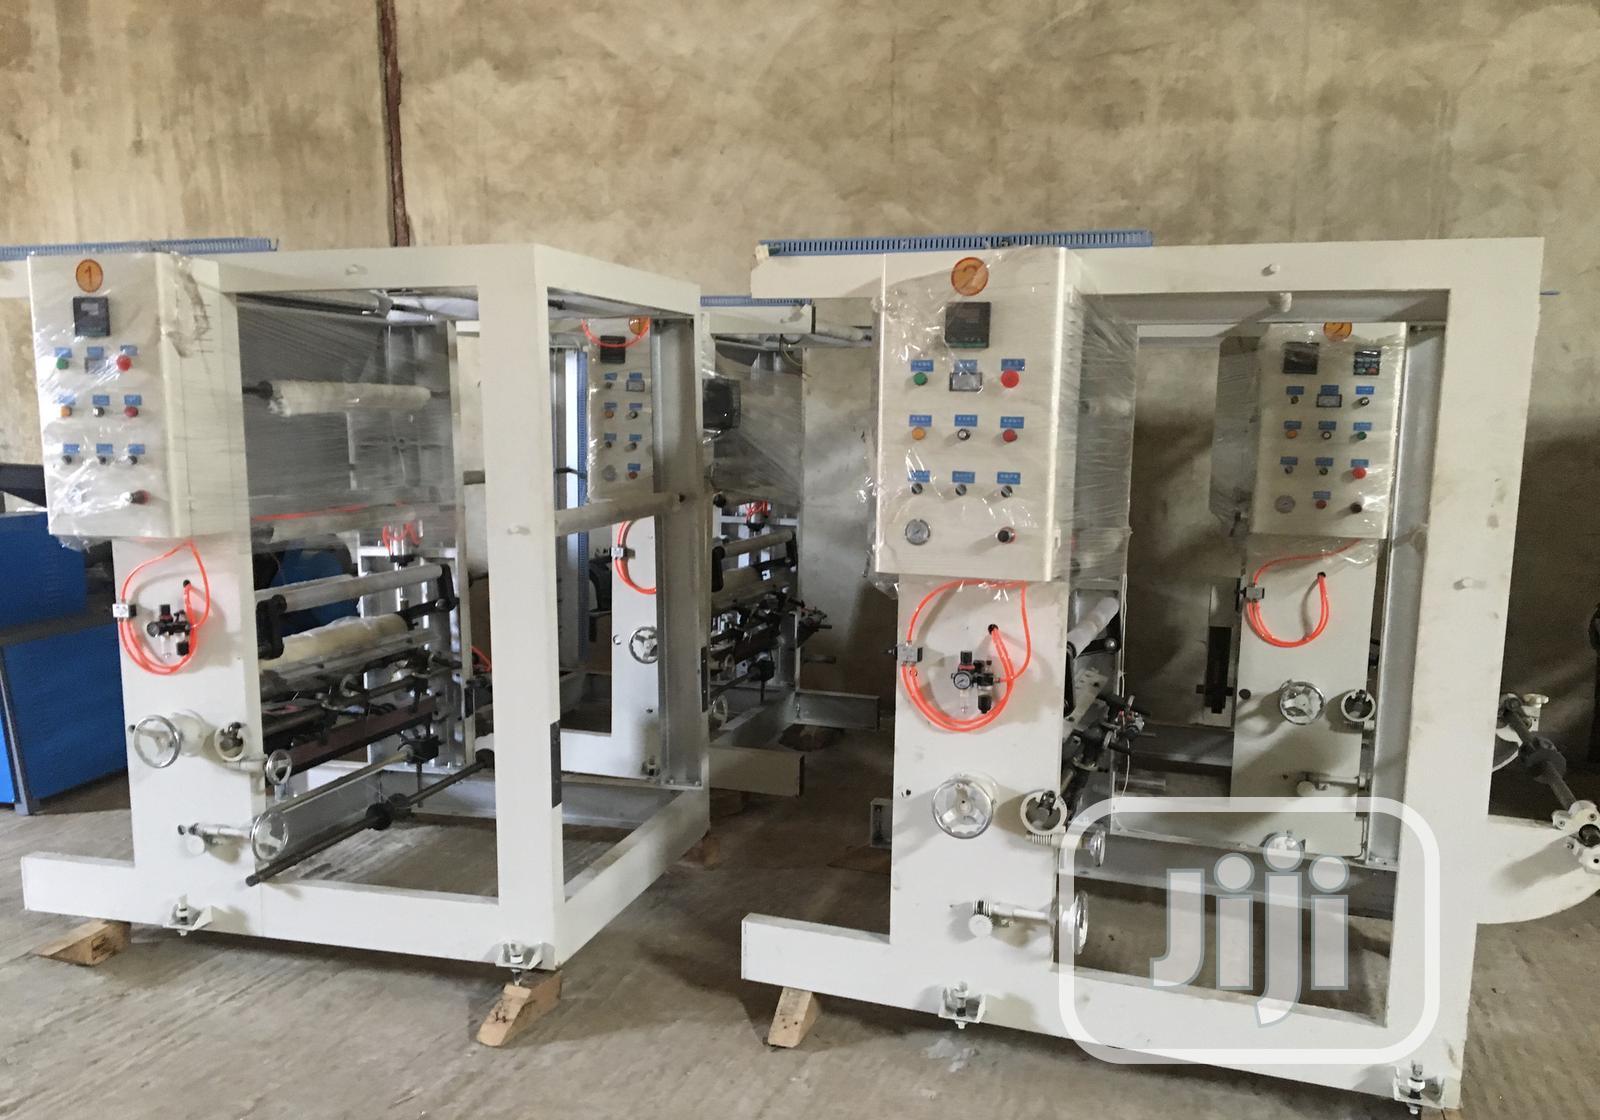 Nylon Printing Gravure Print Nylon Printing Machine | Manufacturing Equipment for sale in Ojo, Lagos State, Nigeria